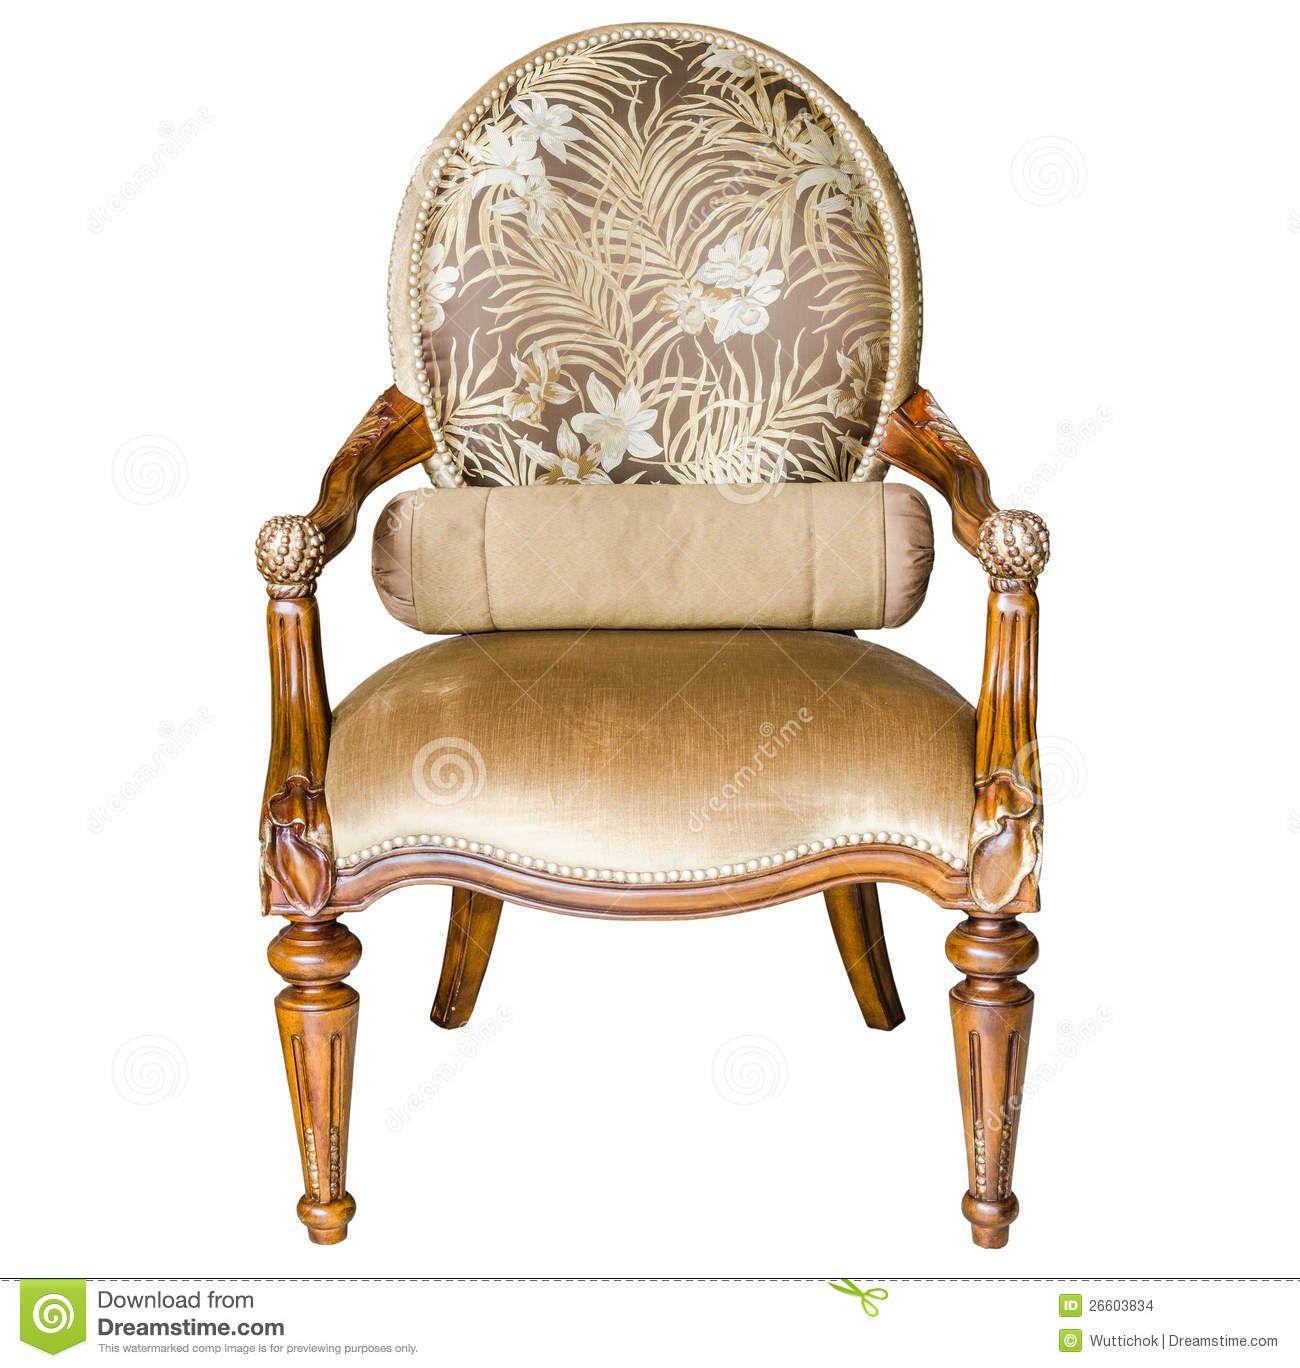 Klassische Antike Stuhle Arten Von Rocking Stuhle Mobel Stuhl Stile Bequemen Lehnsessel Tropischen Akzent Stuhle Klassiker Sofa D Chair Styles Wood Chair Chair